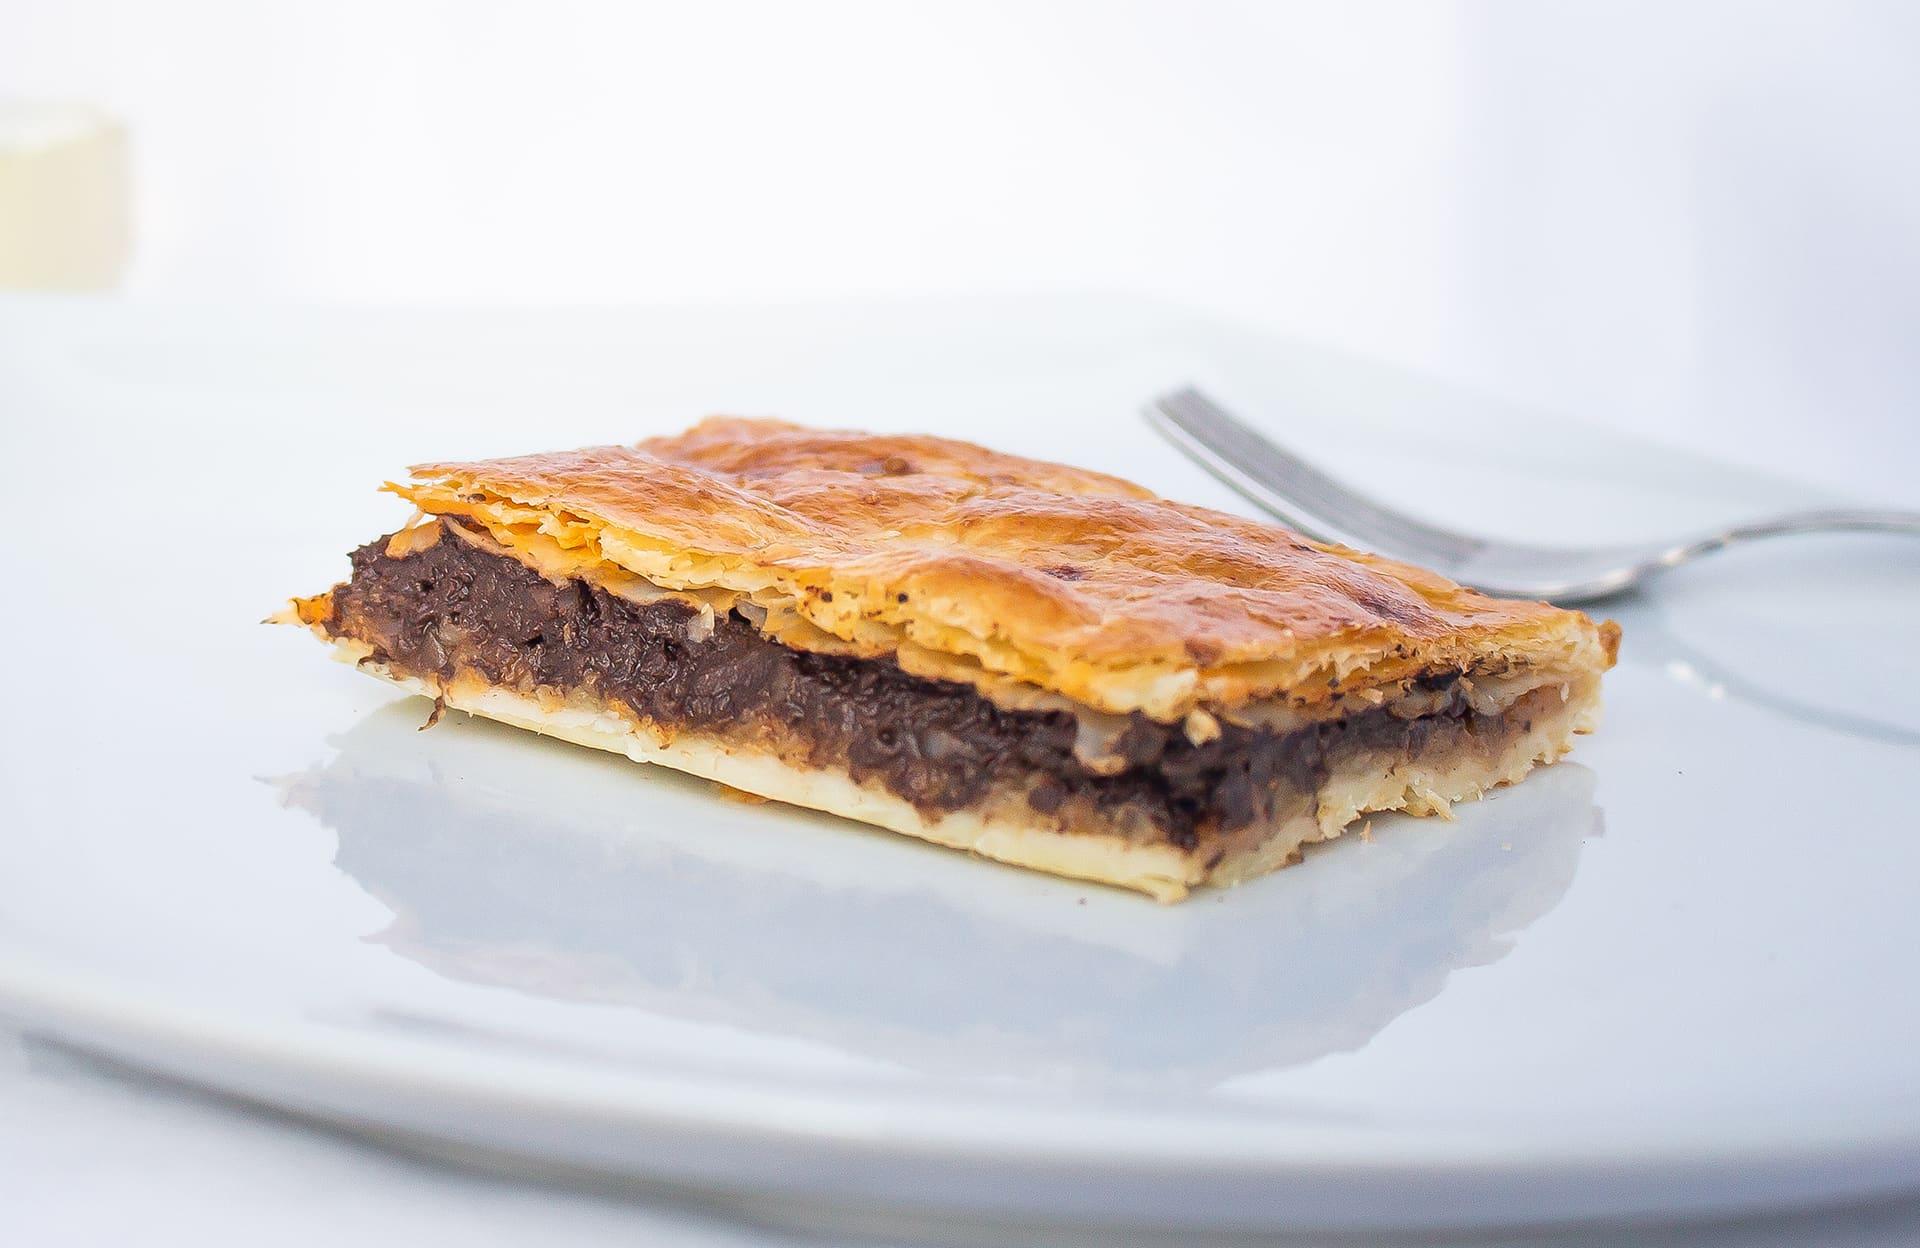 Empanada de morcilla de León o morcilla matachana con manzana reineta del Bierzo